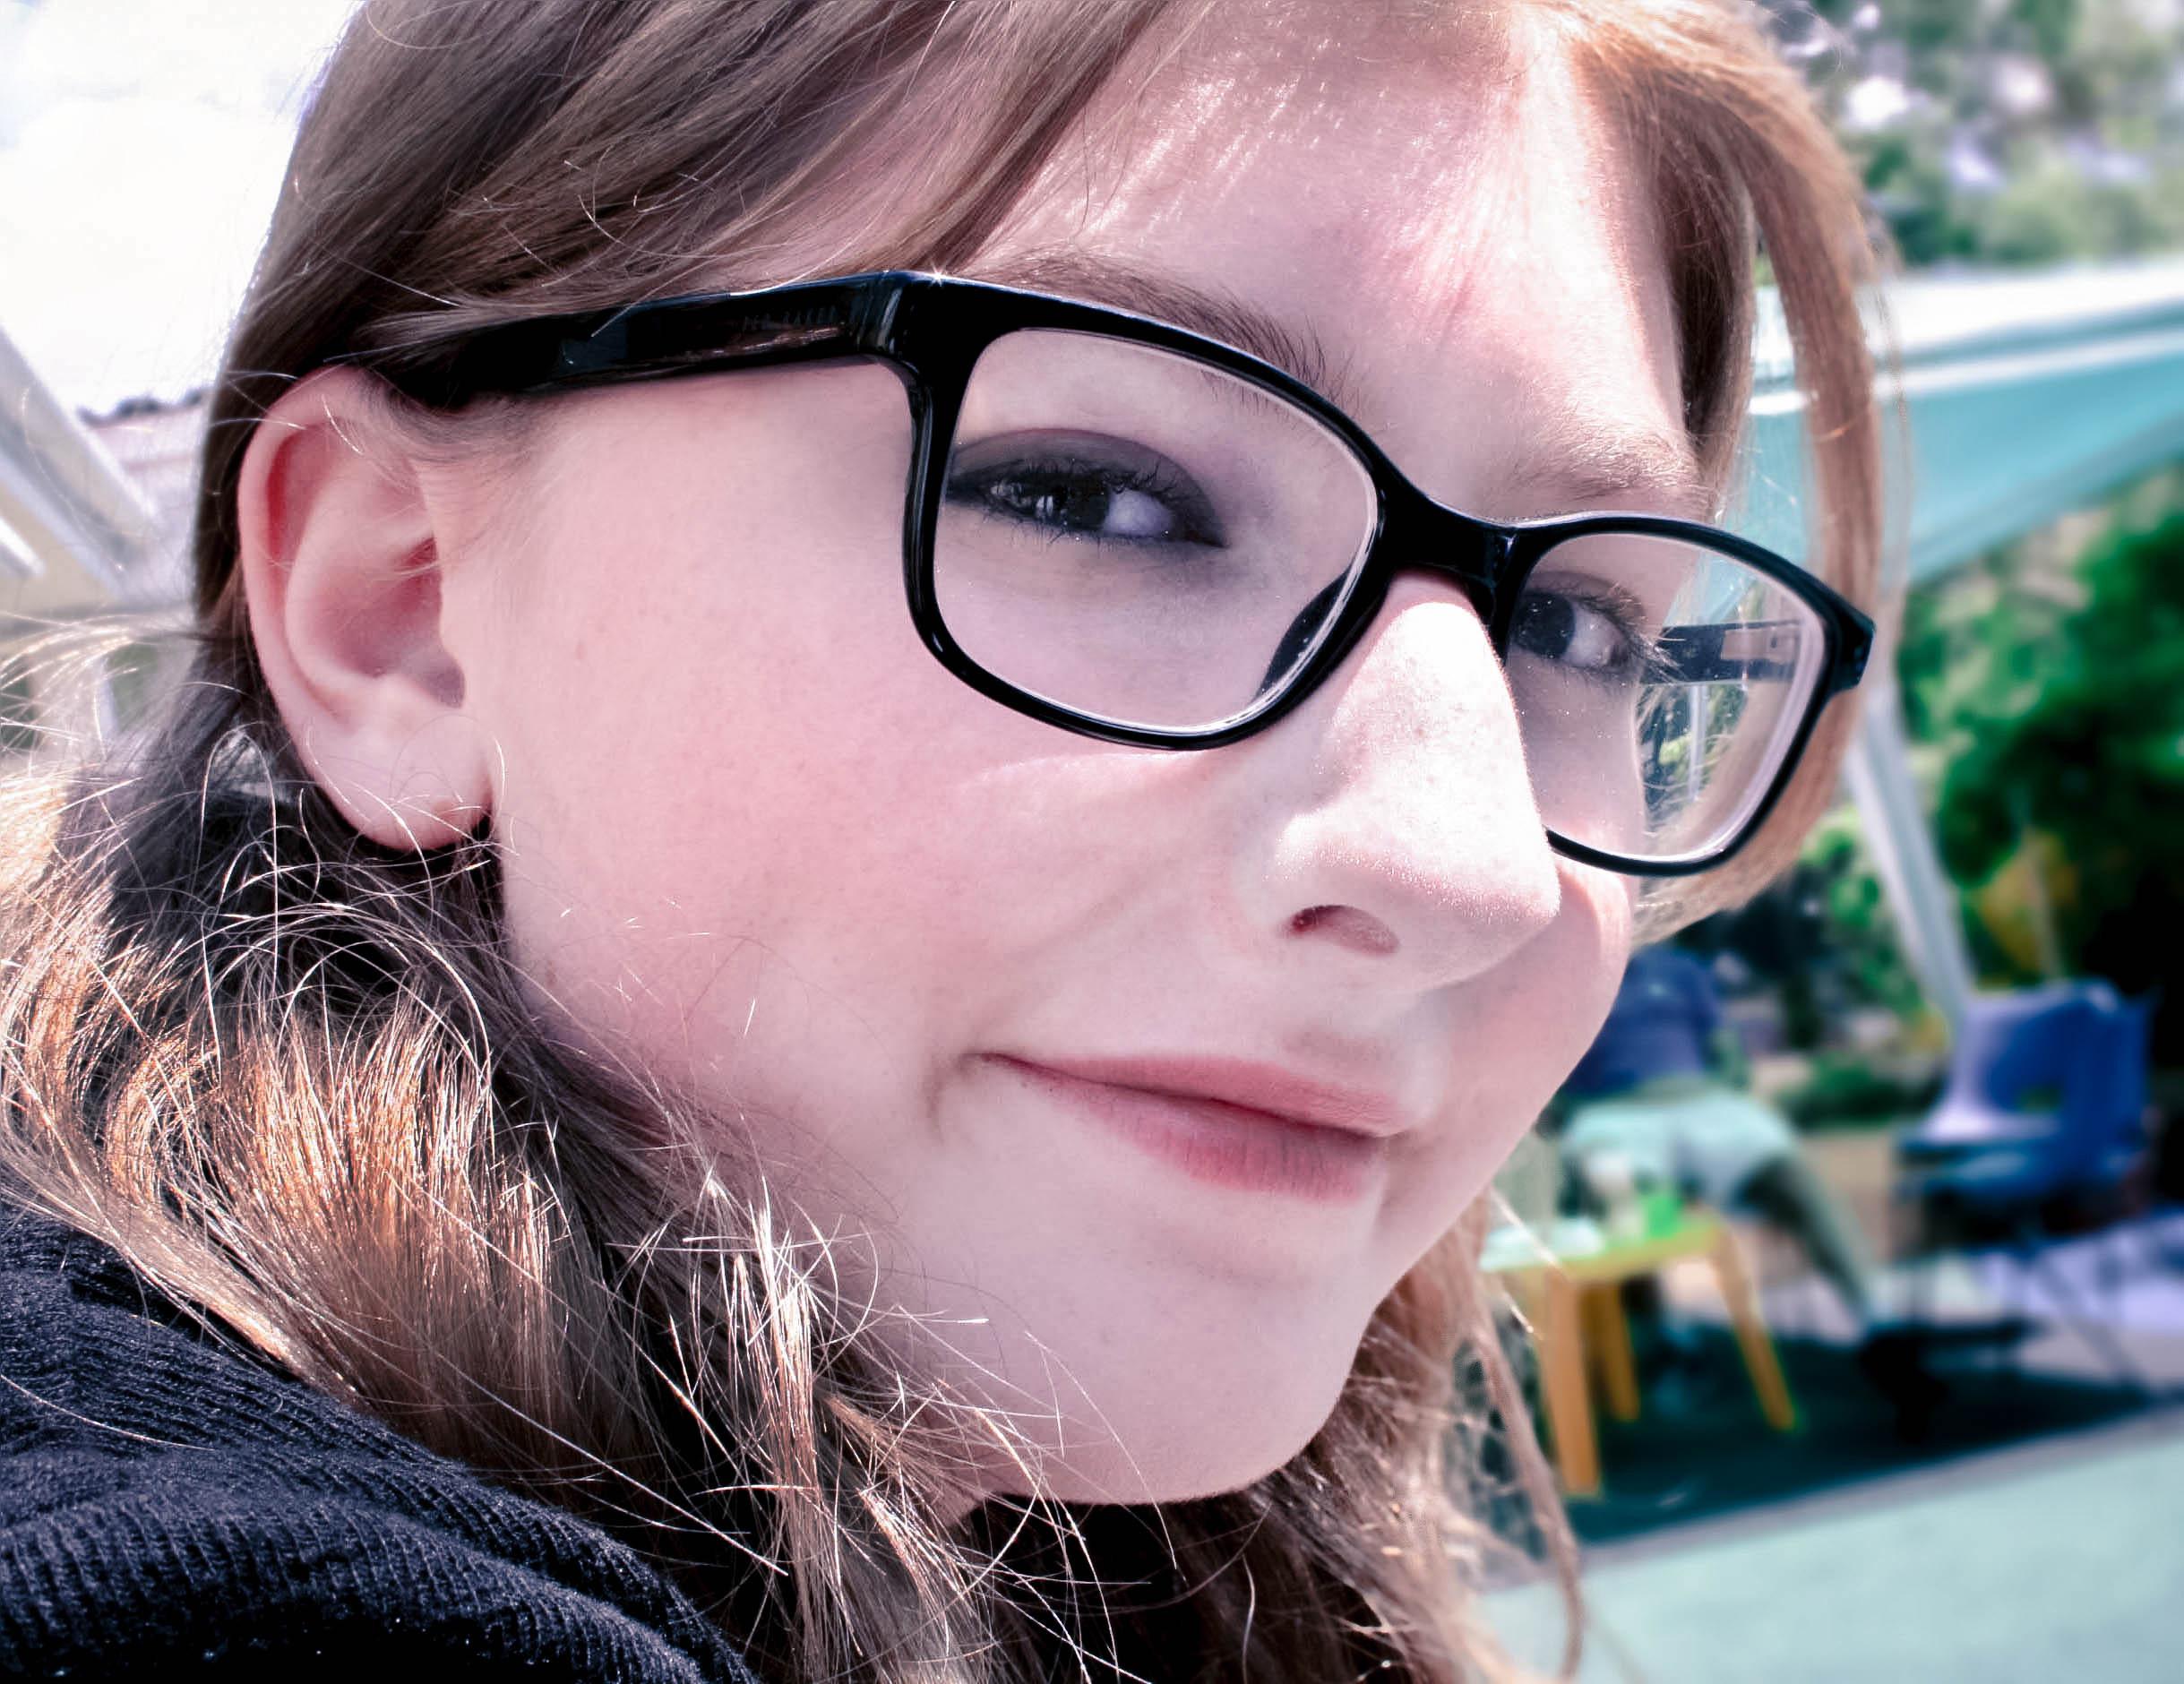 Wallpaper : face, Photoshop, model, sunglasses, glasses, simple ...